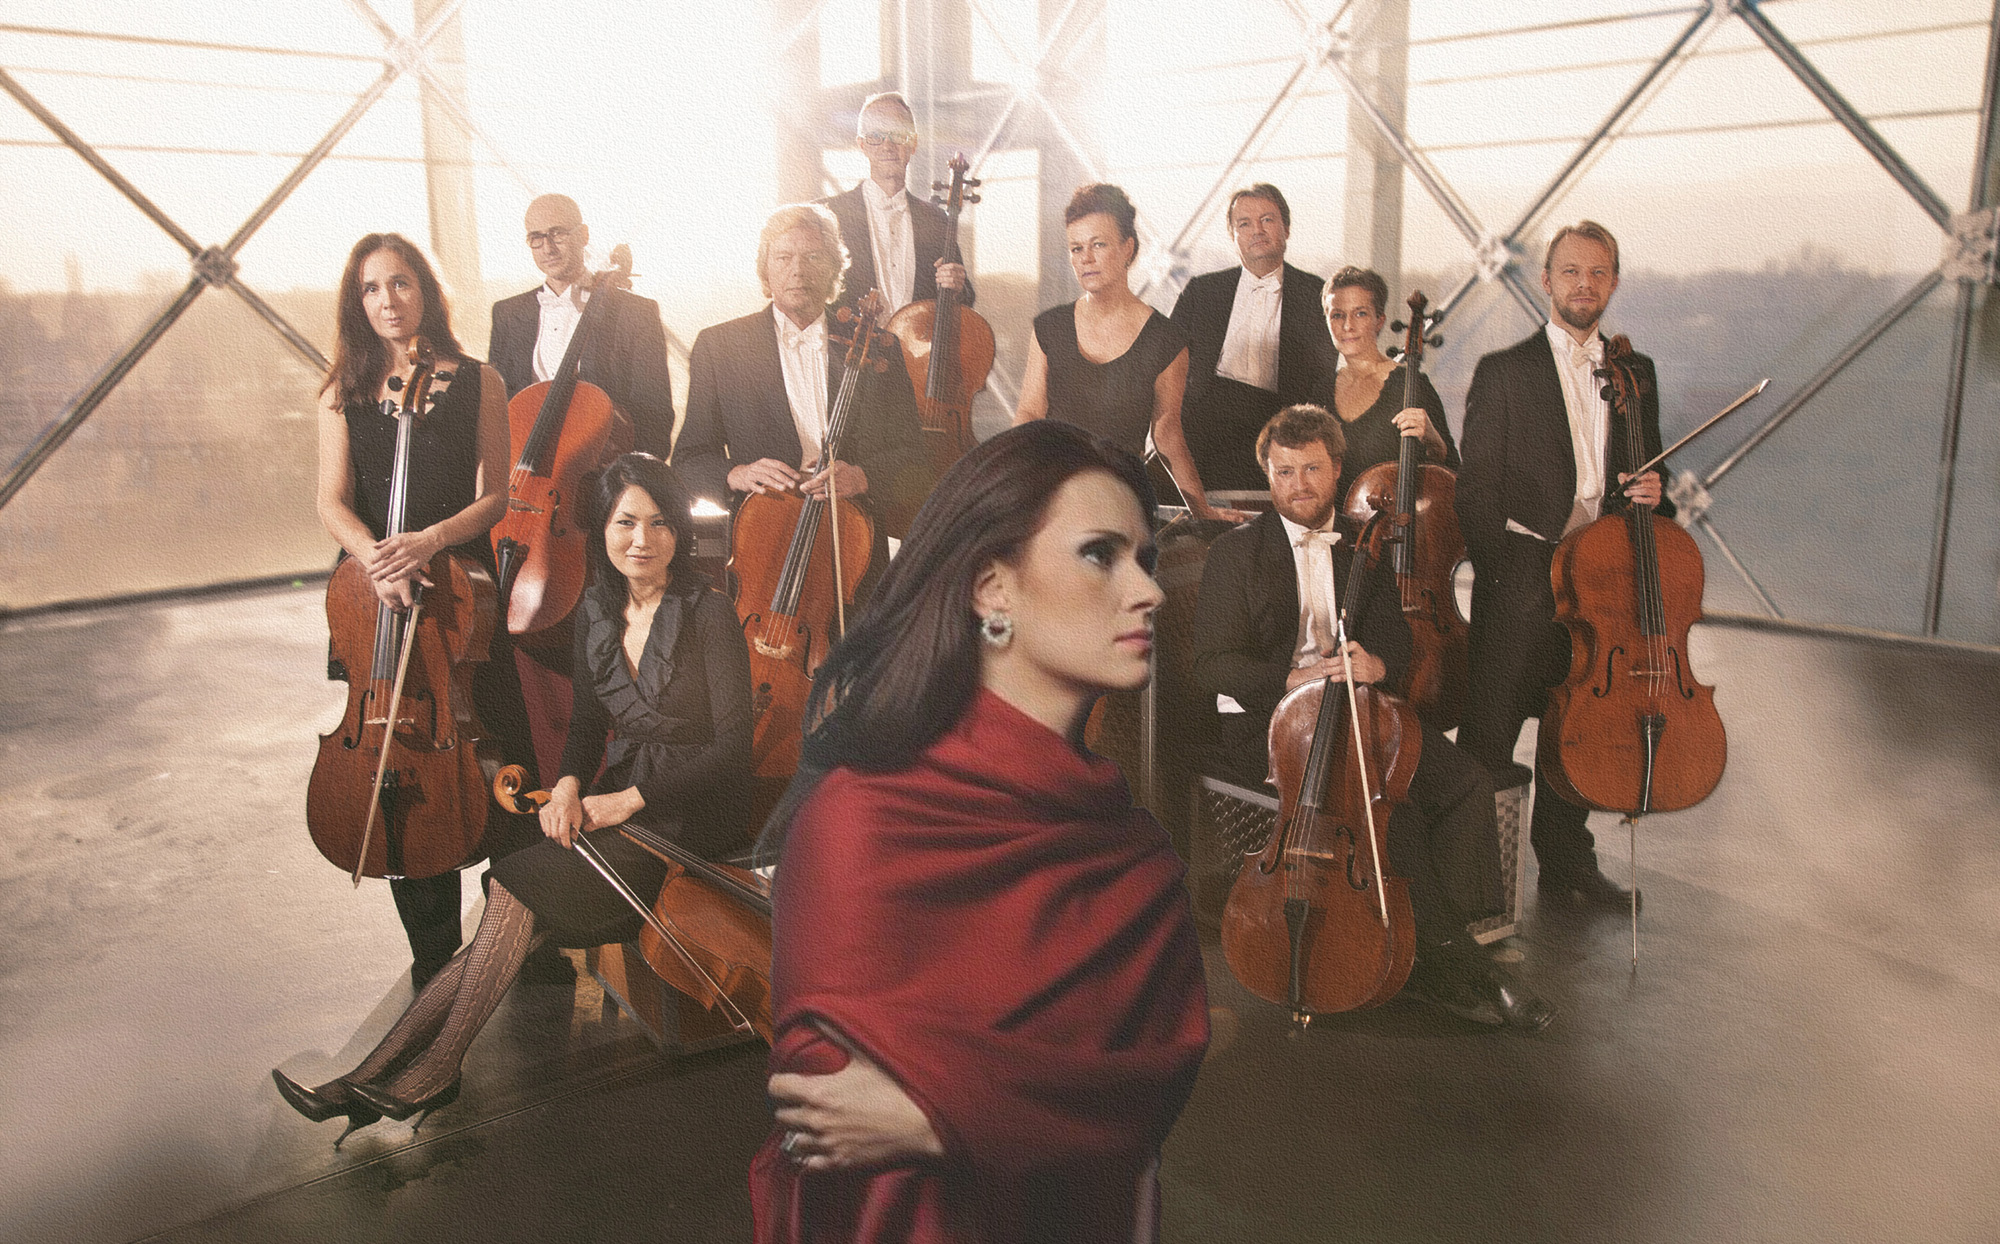 HKMF-Celloensemble-and-Gabriella-Pace